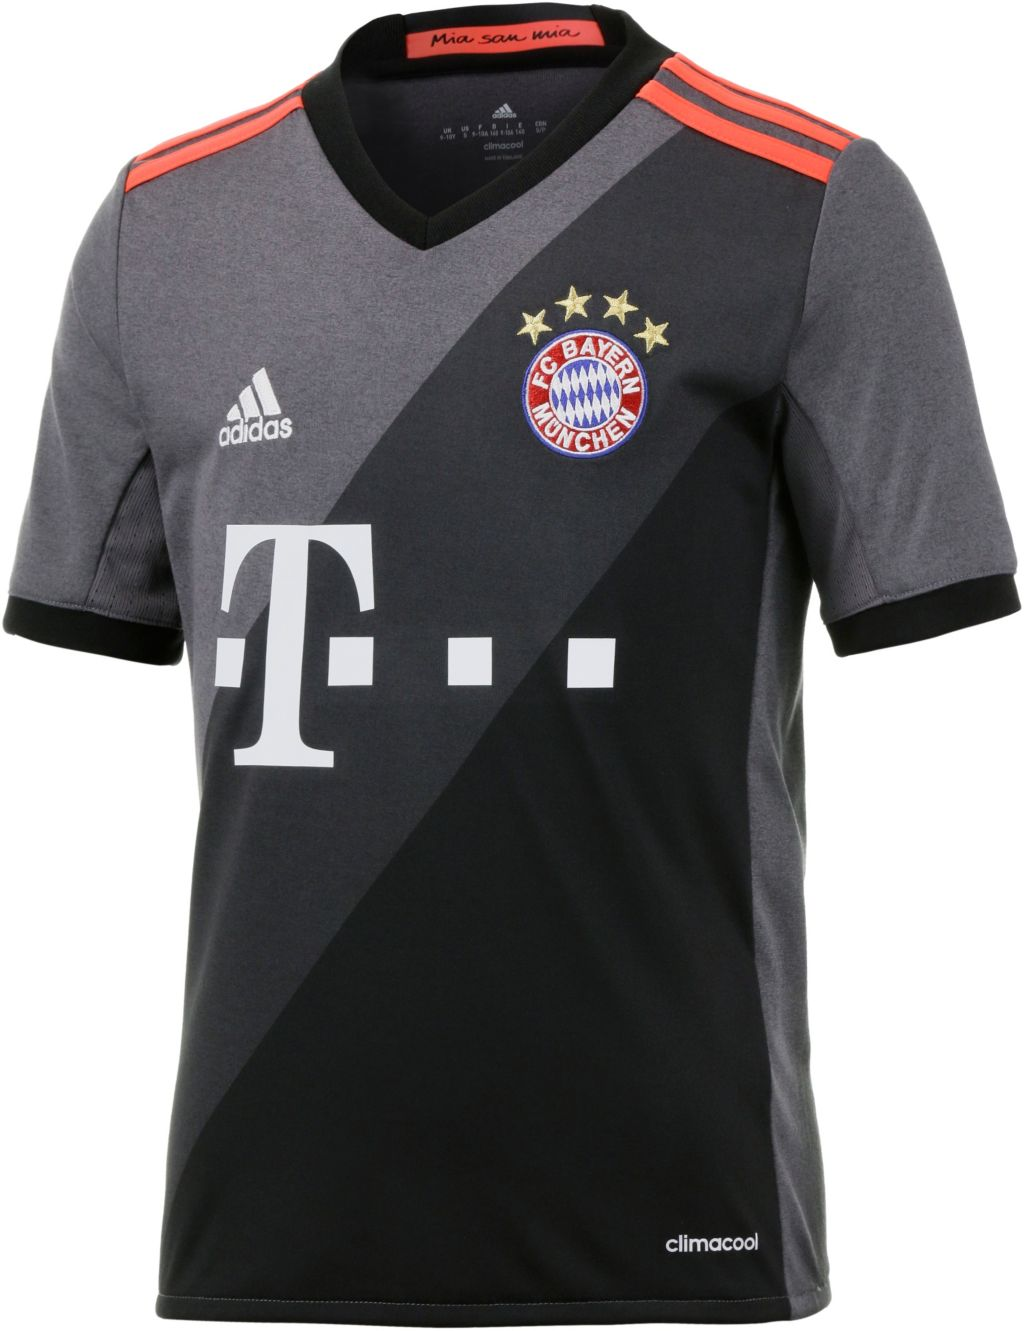 FC Bayern München 16/17 Auswärts Fußballtrikot Kinder mehrfarbig, Größe 128